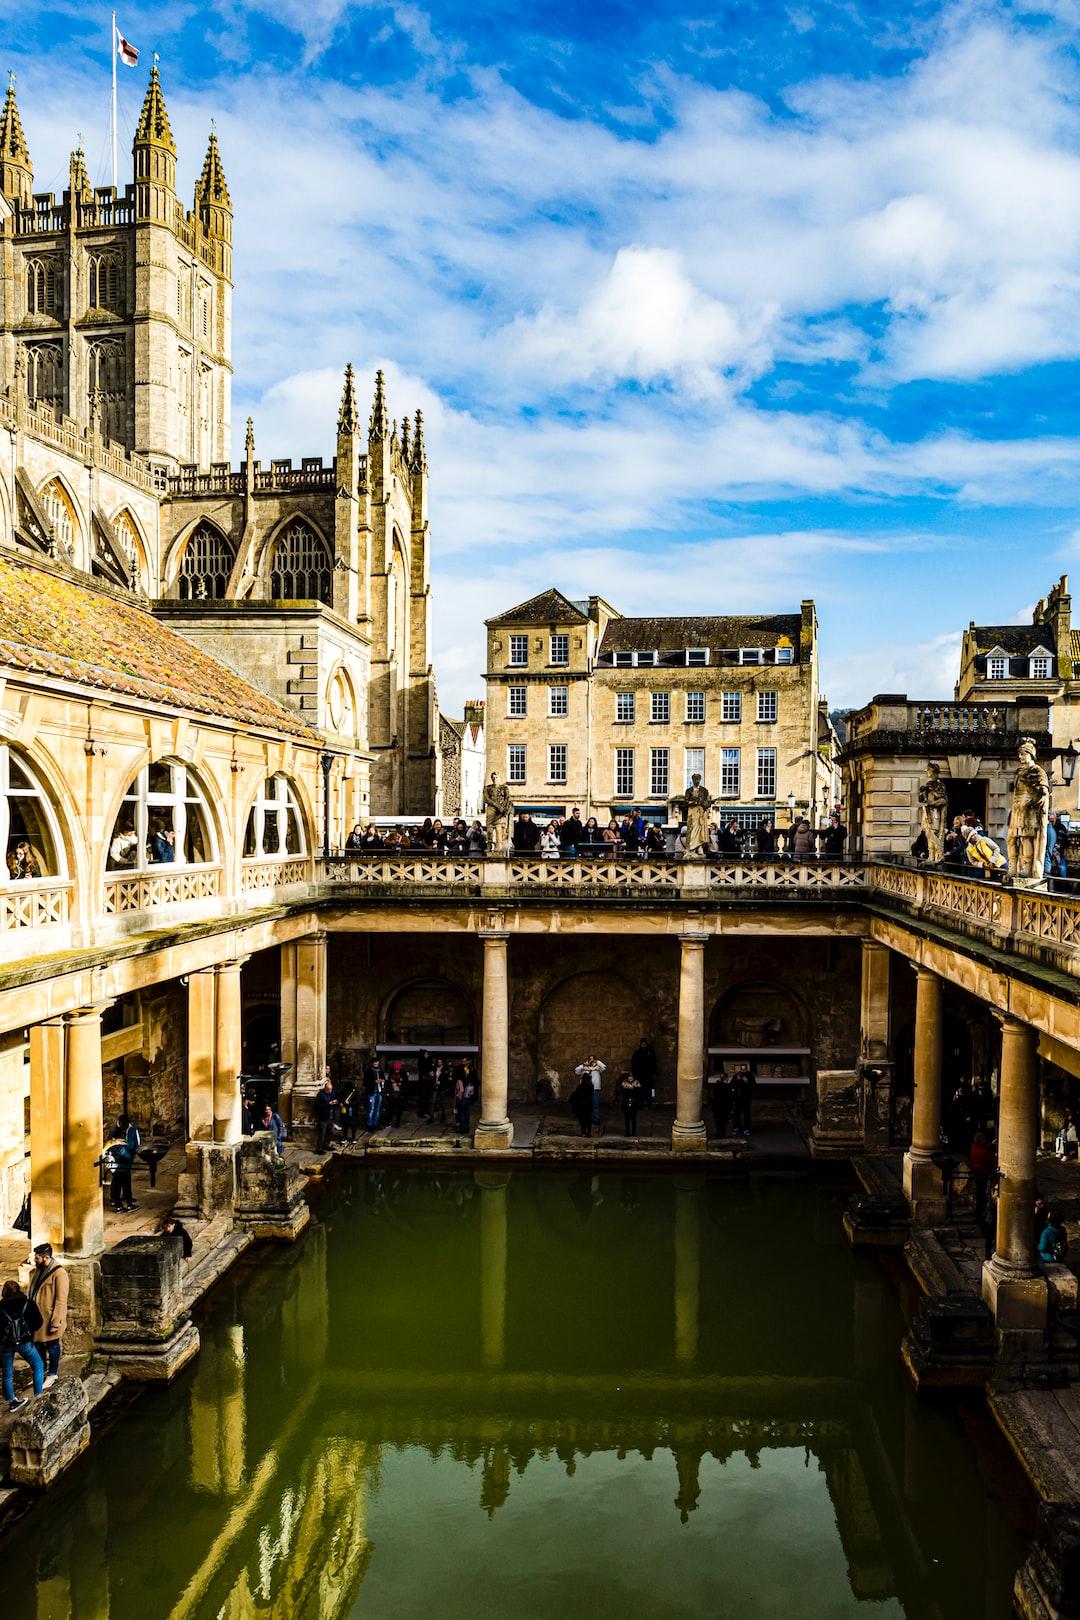 Antique historic landmark Roman Baths in Bath England UK, February 2020.